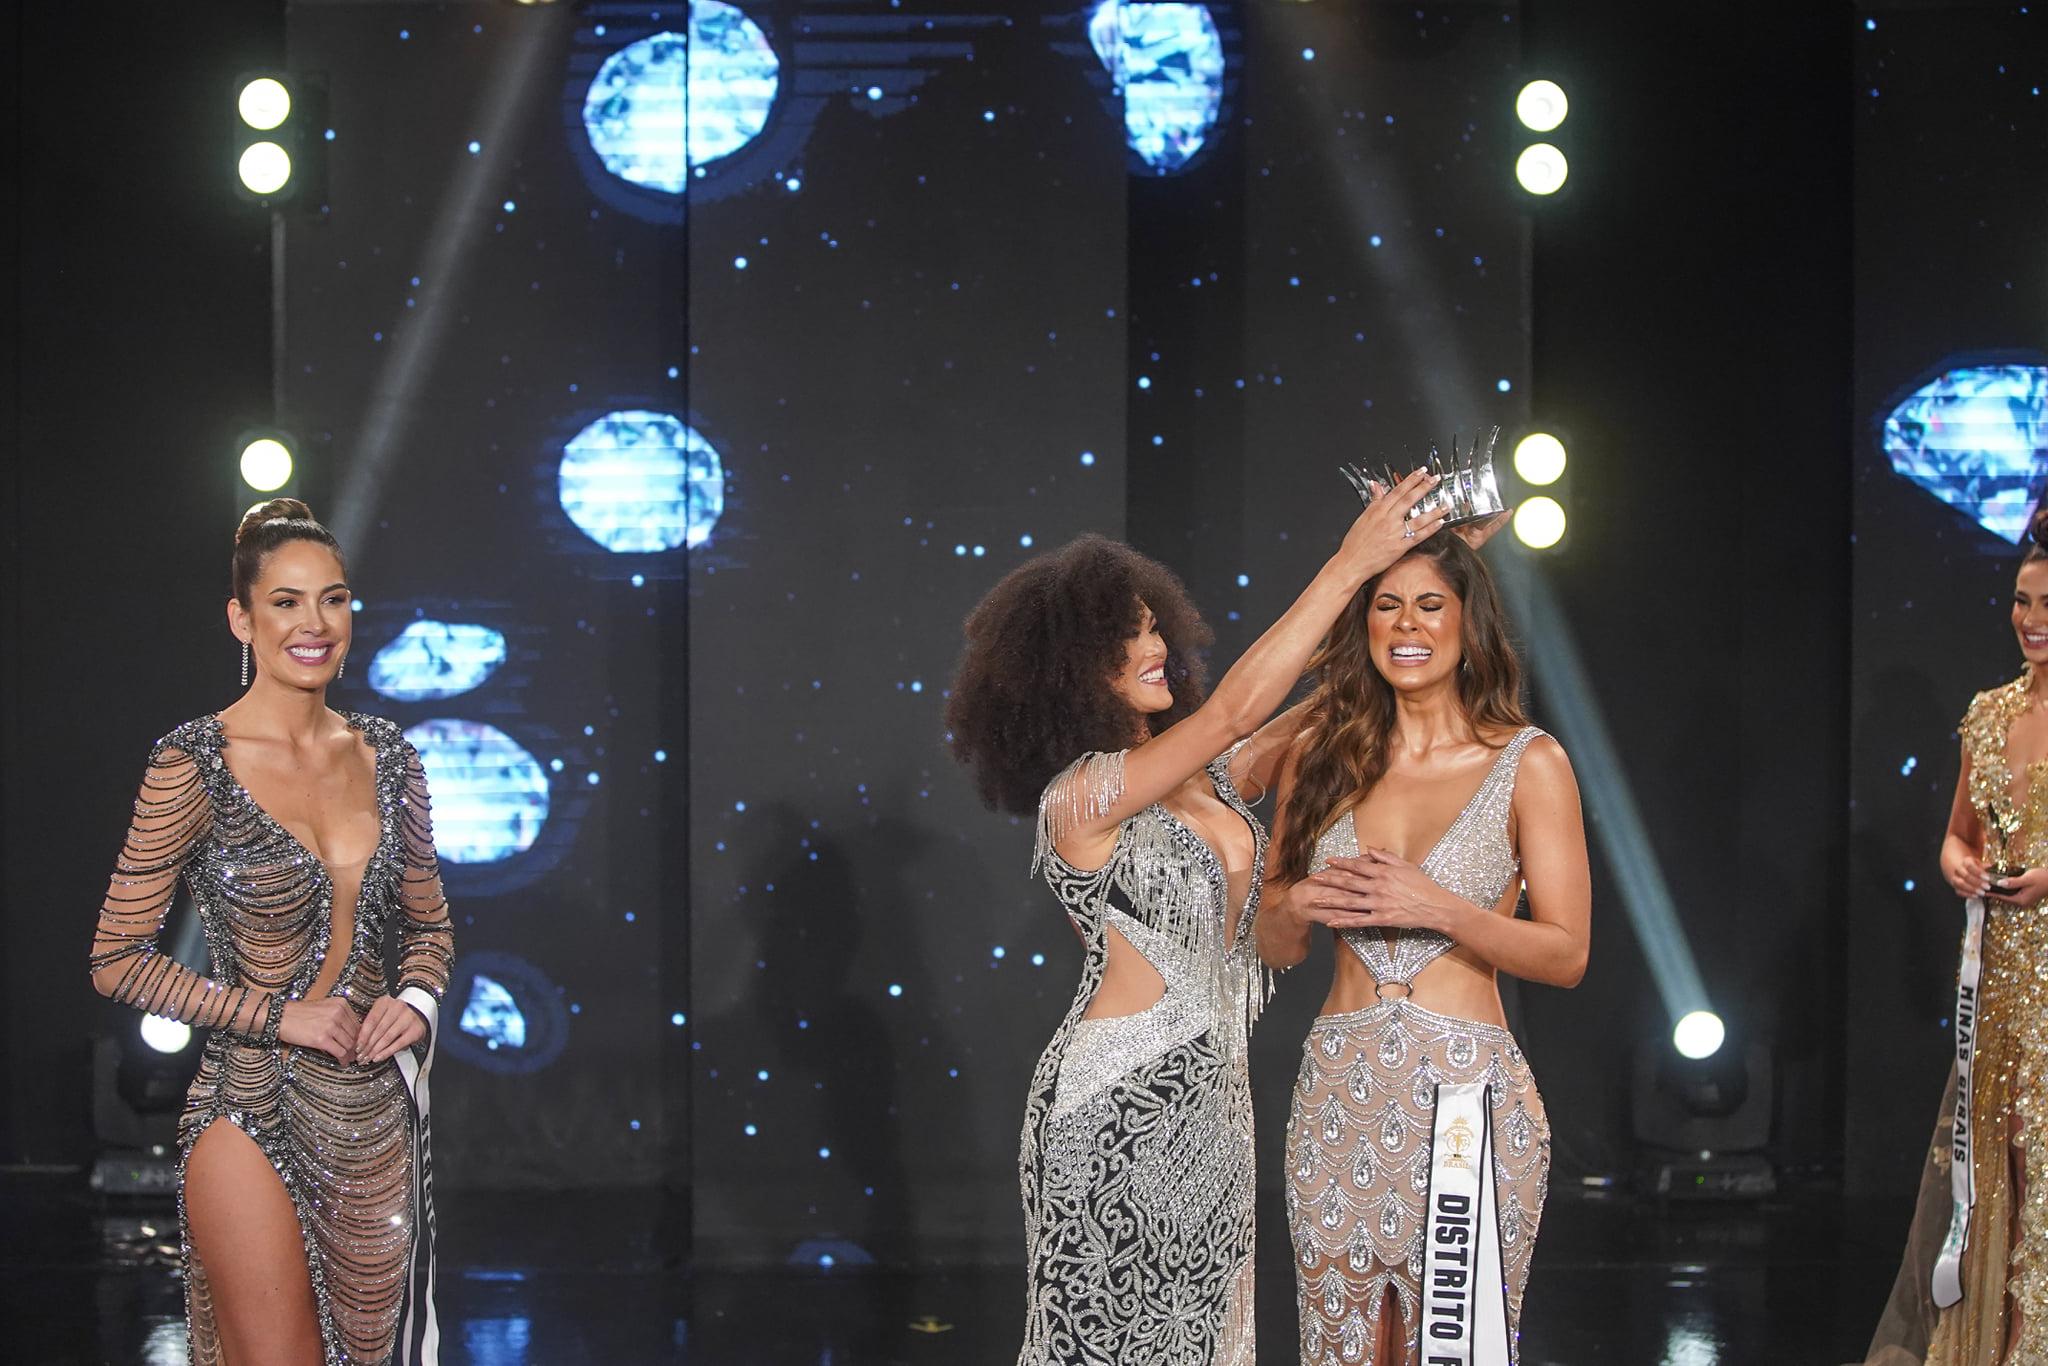 bruna zanardo, 1st runner-up de miss supranational brazil 2020/miss brasil internacional 2017/miss brasil terra 2016. - Página 20 12857810